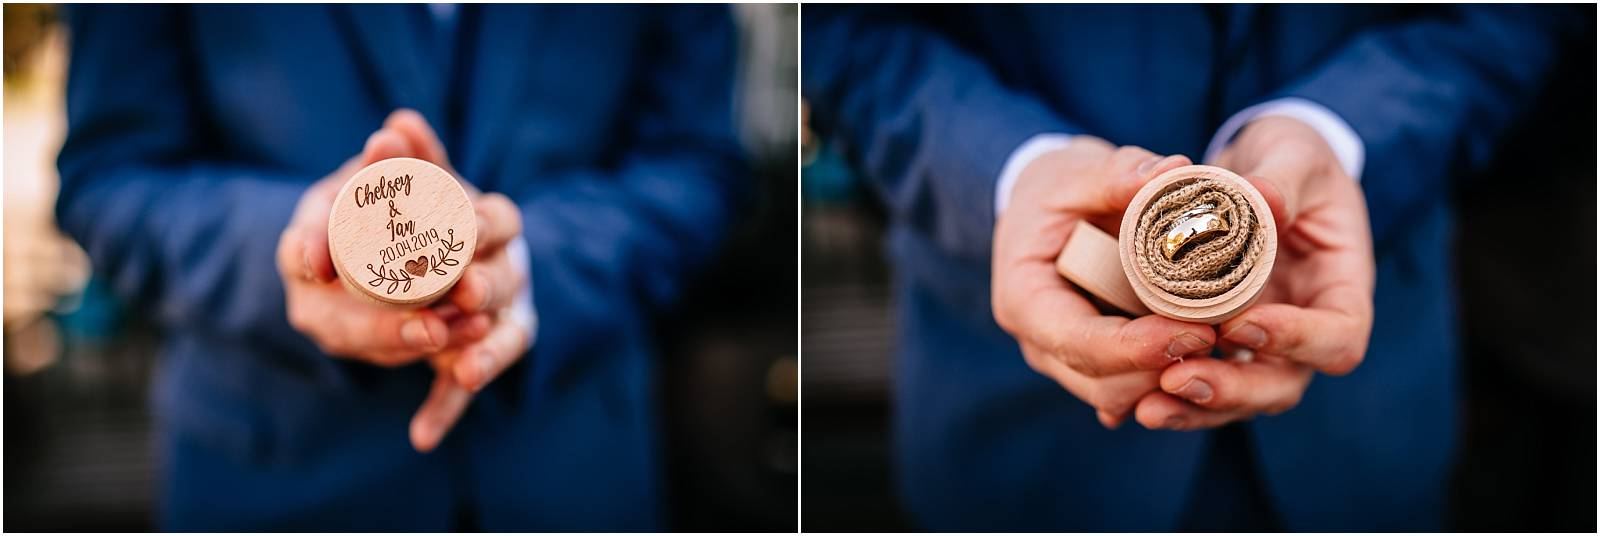 best man holding wedding rings